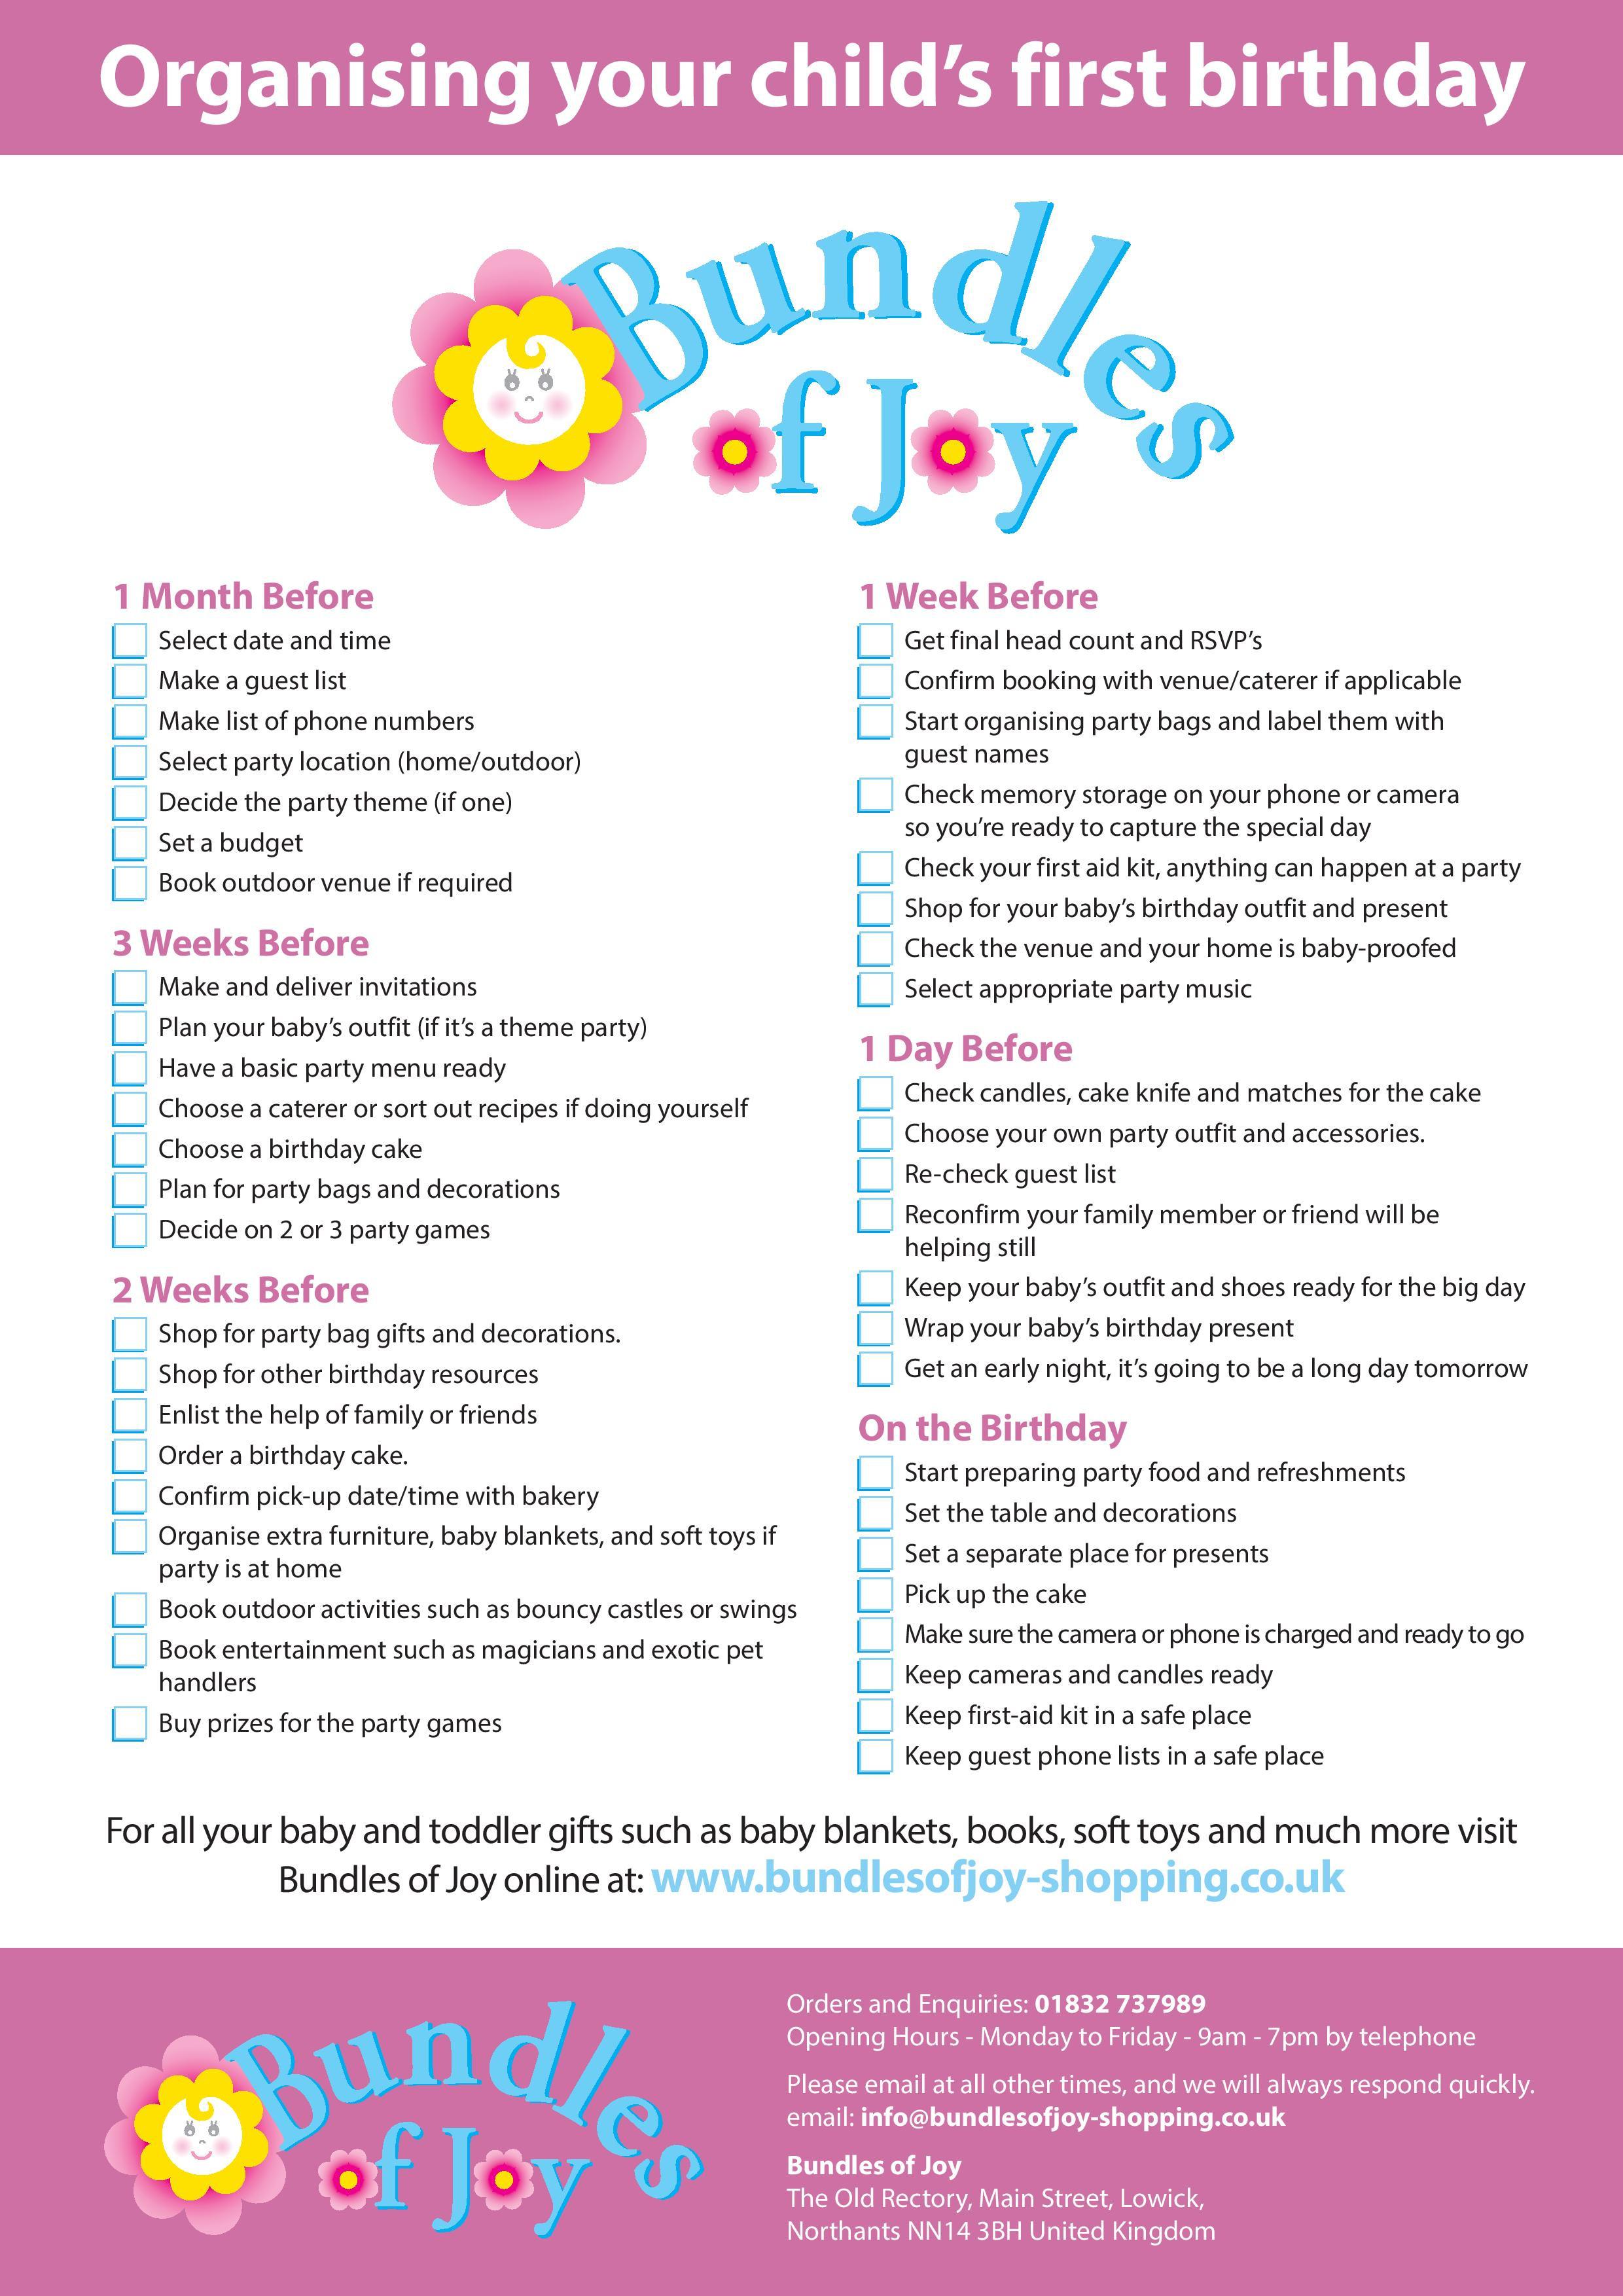 Best ideas about 1st Birthday Party Checklist . Save or Pin 1st Birthday Checklist Bundles of Joy Now.